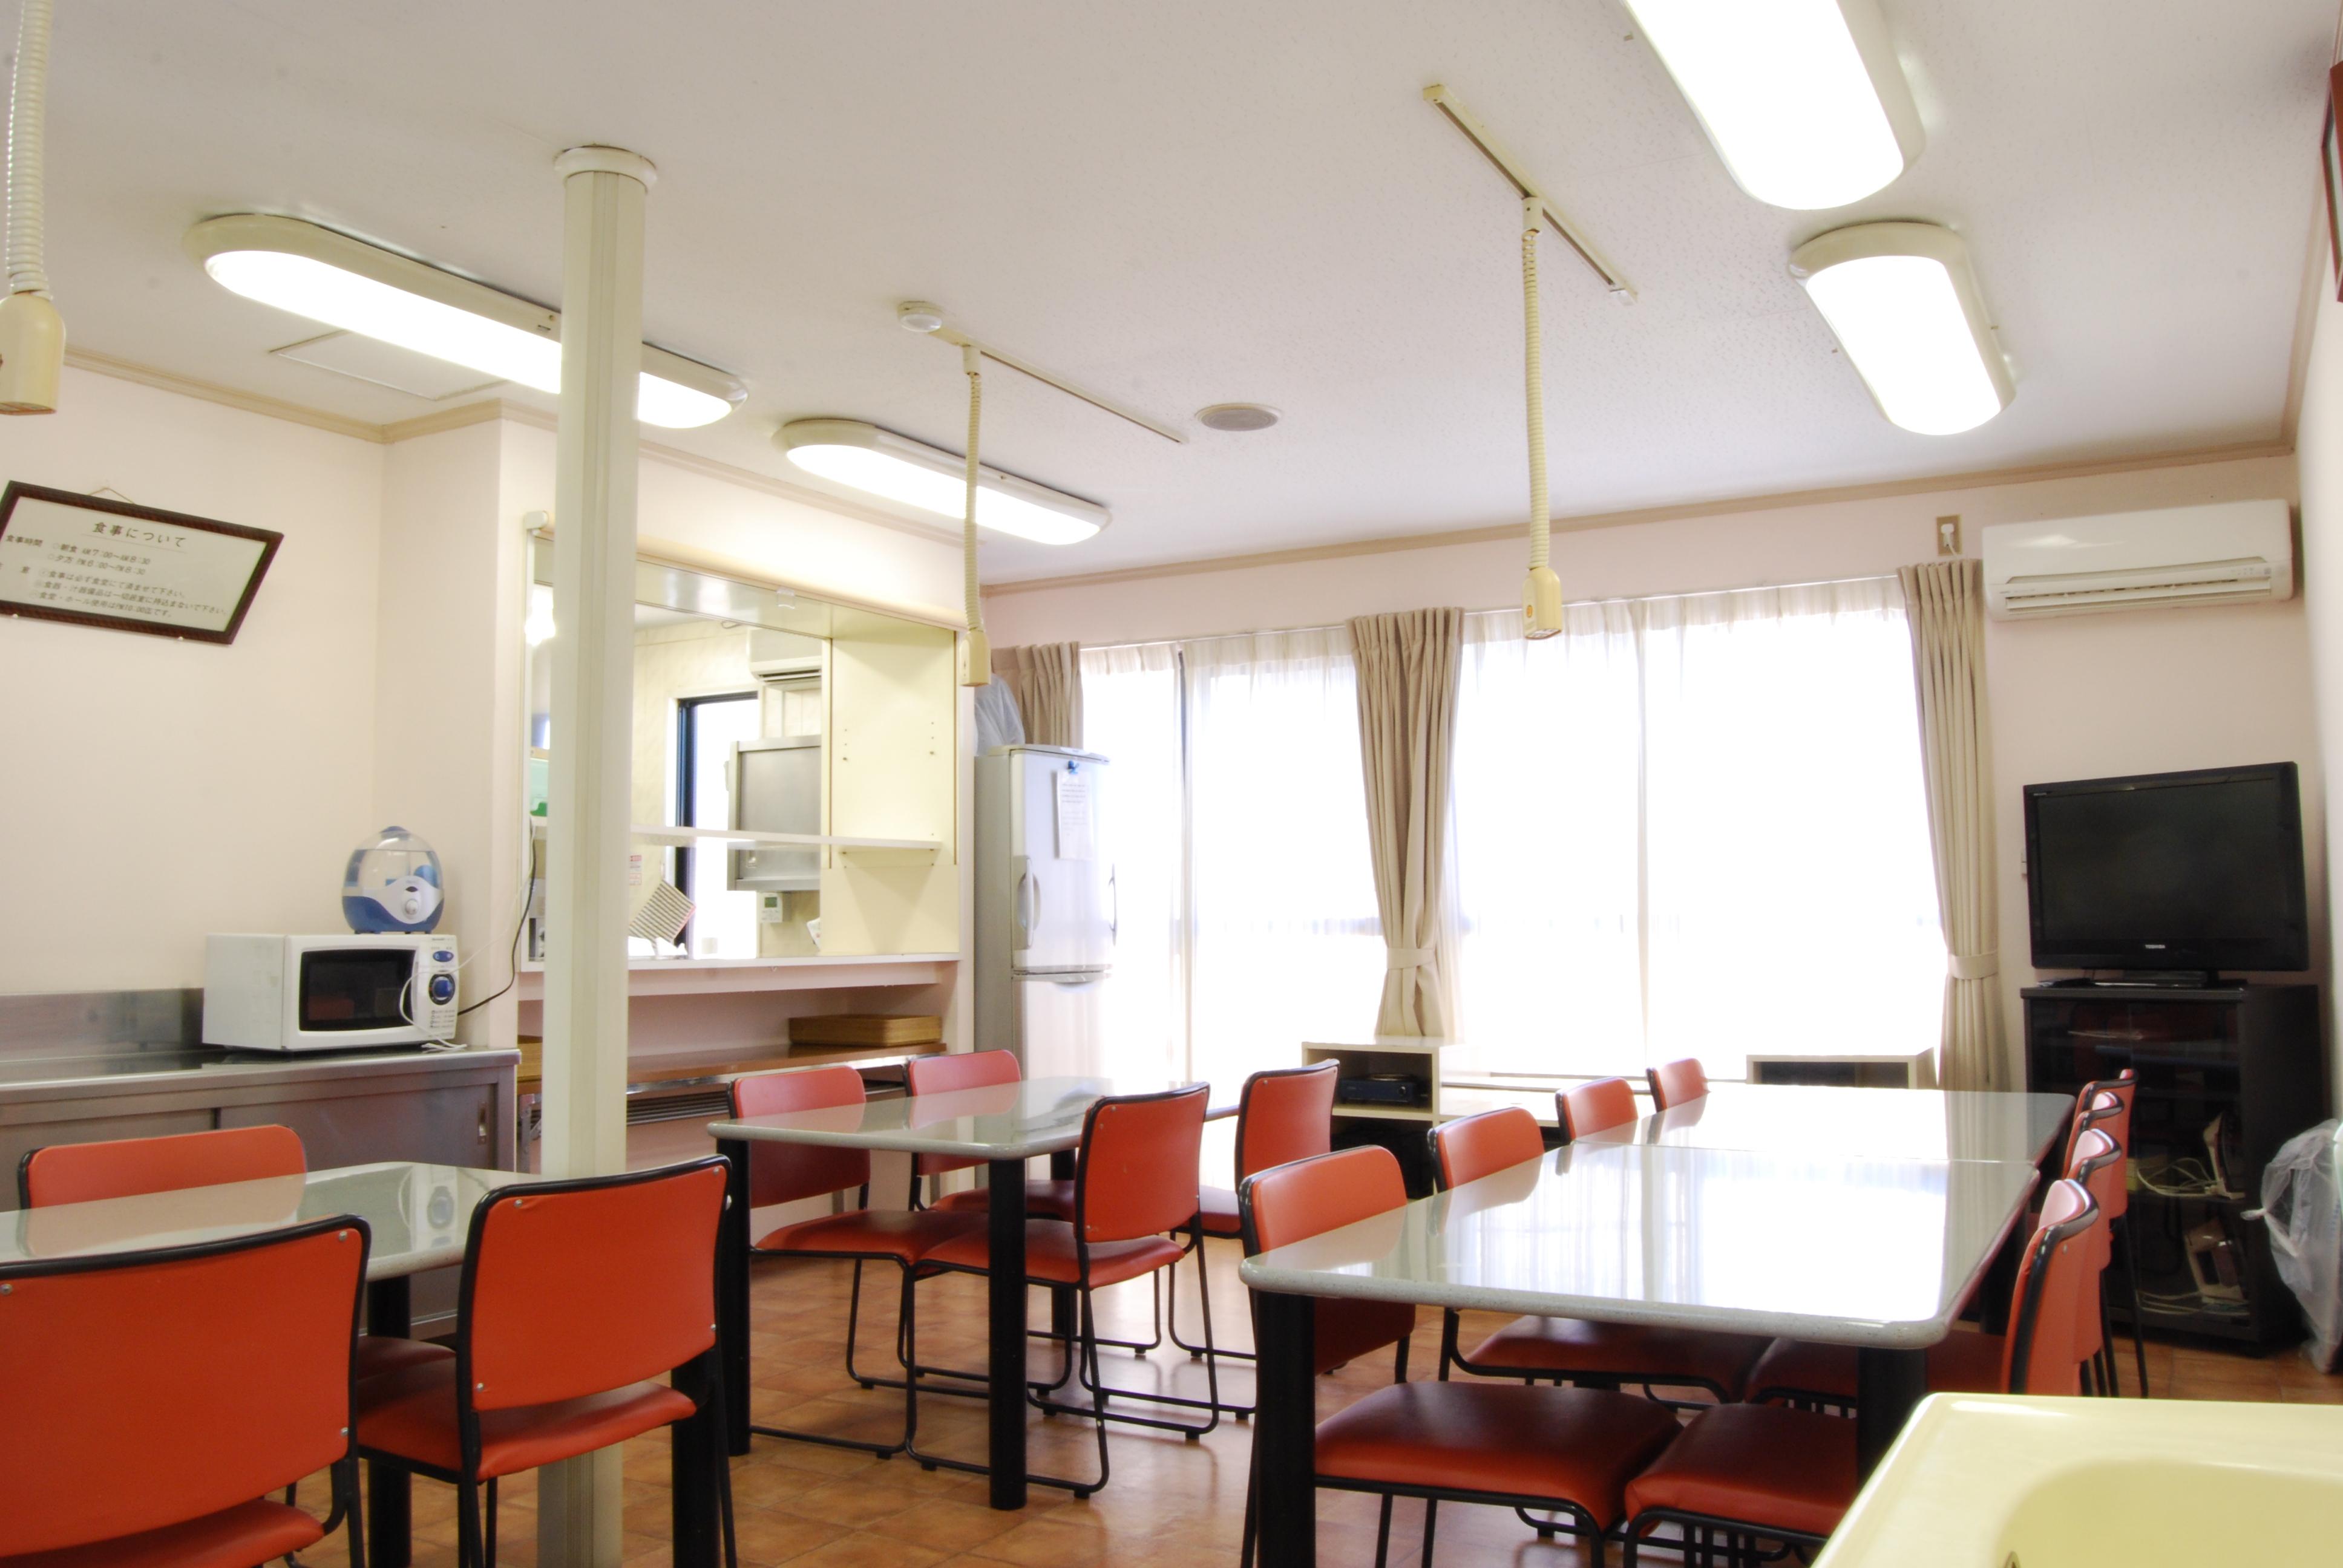 WID Tanashi 2 | WID&DORMY | Dormitories affiliated with Waseda